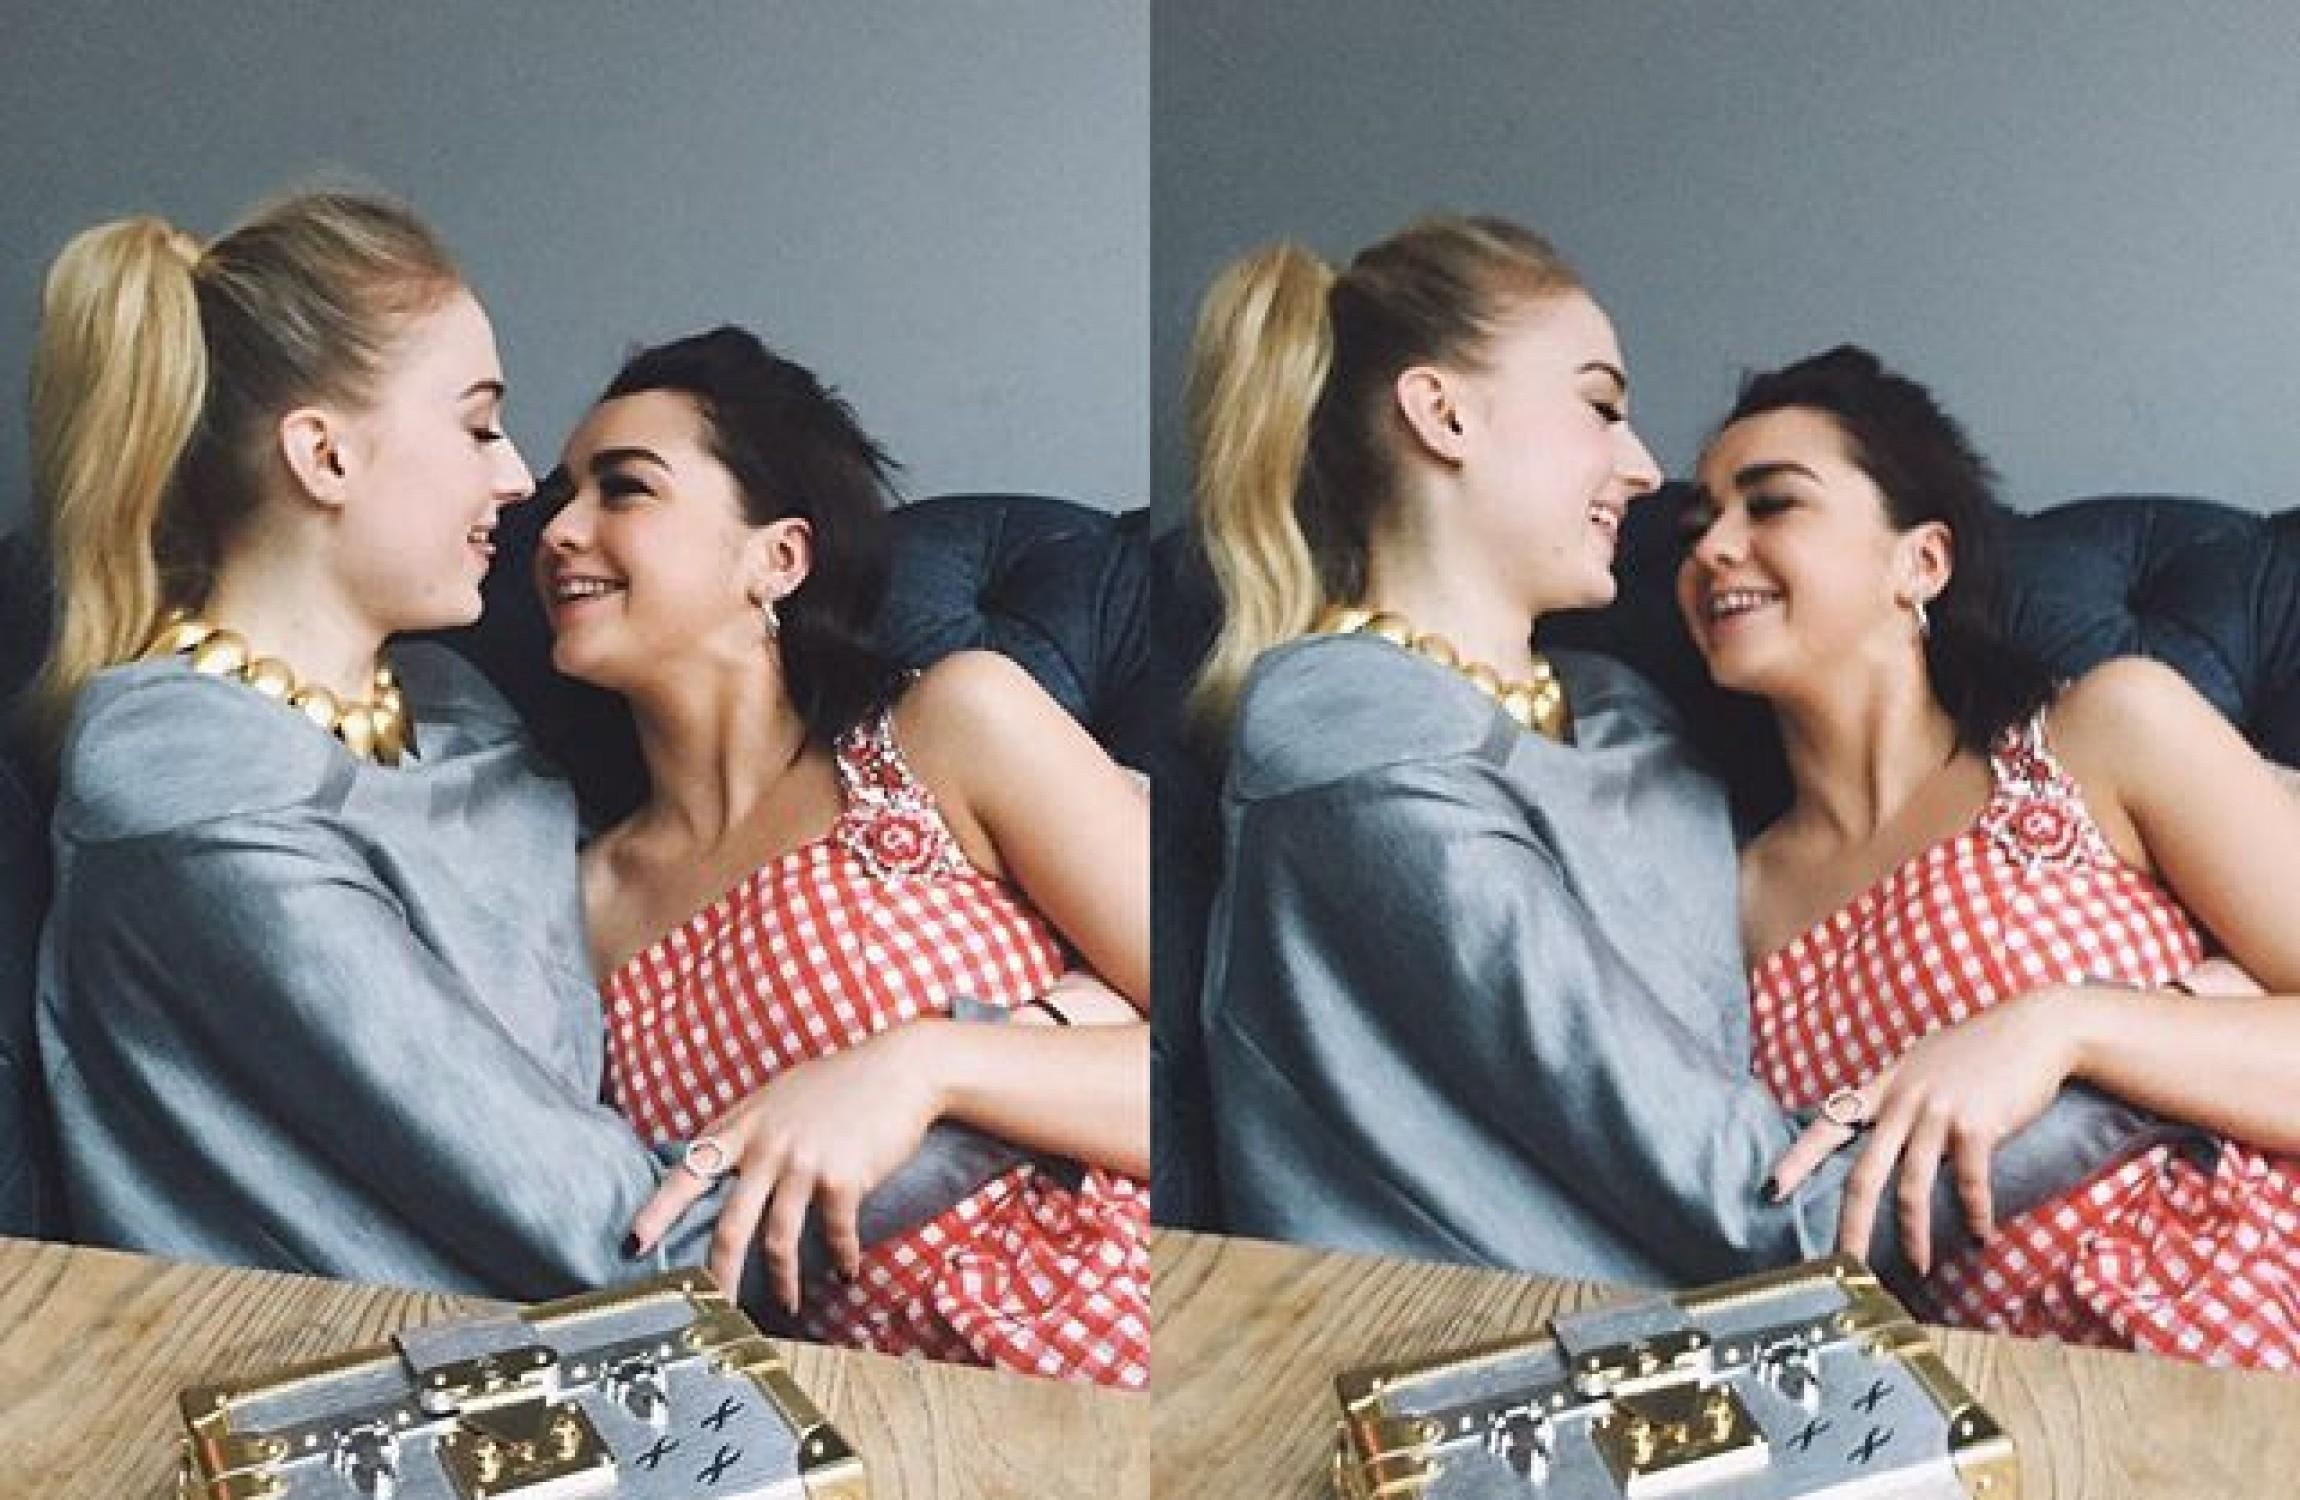 Selfie Sophie Turner and Maisie Williams nude photos 2019